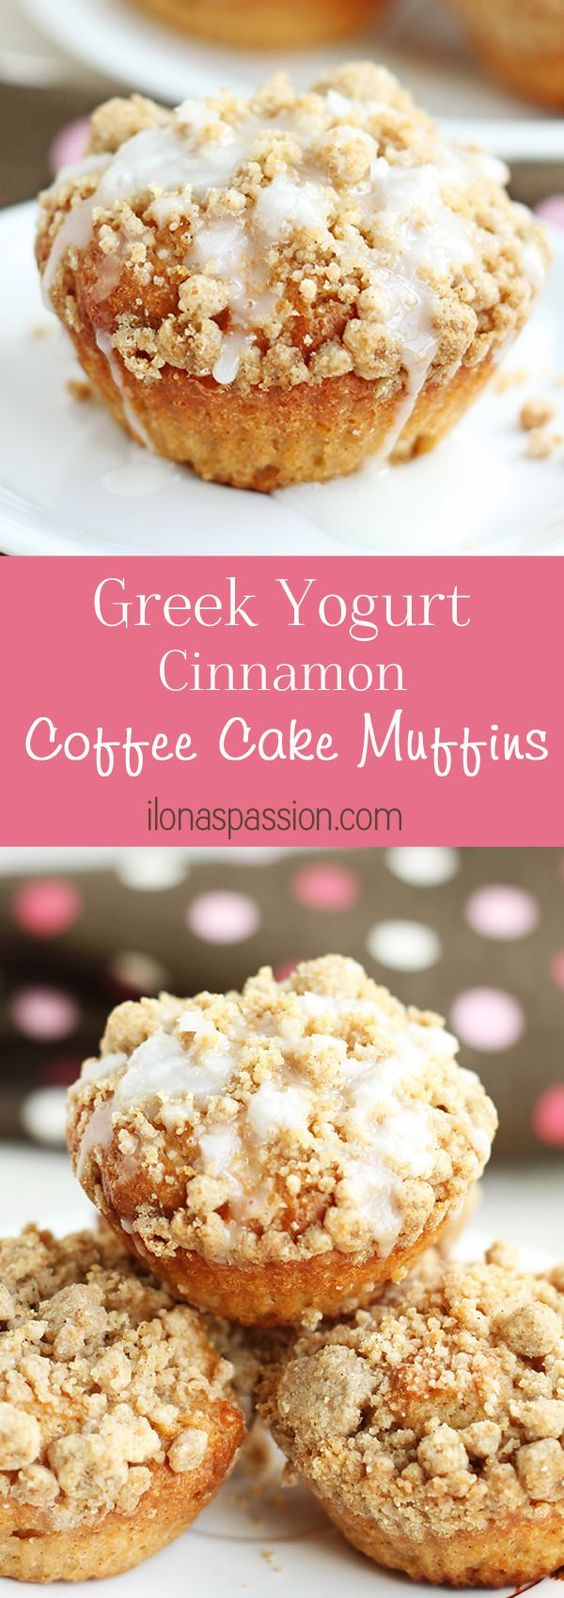 Greek Yogurt Cinnamon Coffee Cake Muffins - Healthier coffee cake muffins recipe made with greek yogurt, cinnamon and brown sugar crumble topping. Delicious coffee cake muffins are great for breakfast! by ilonaspassion.com @ilonaspassion